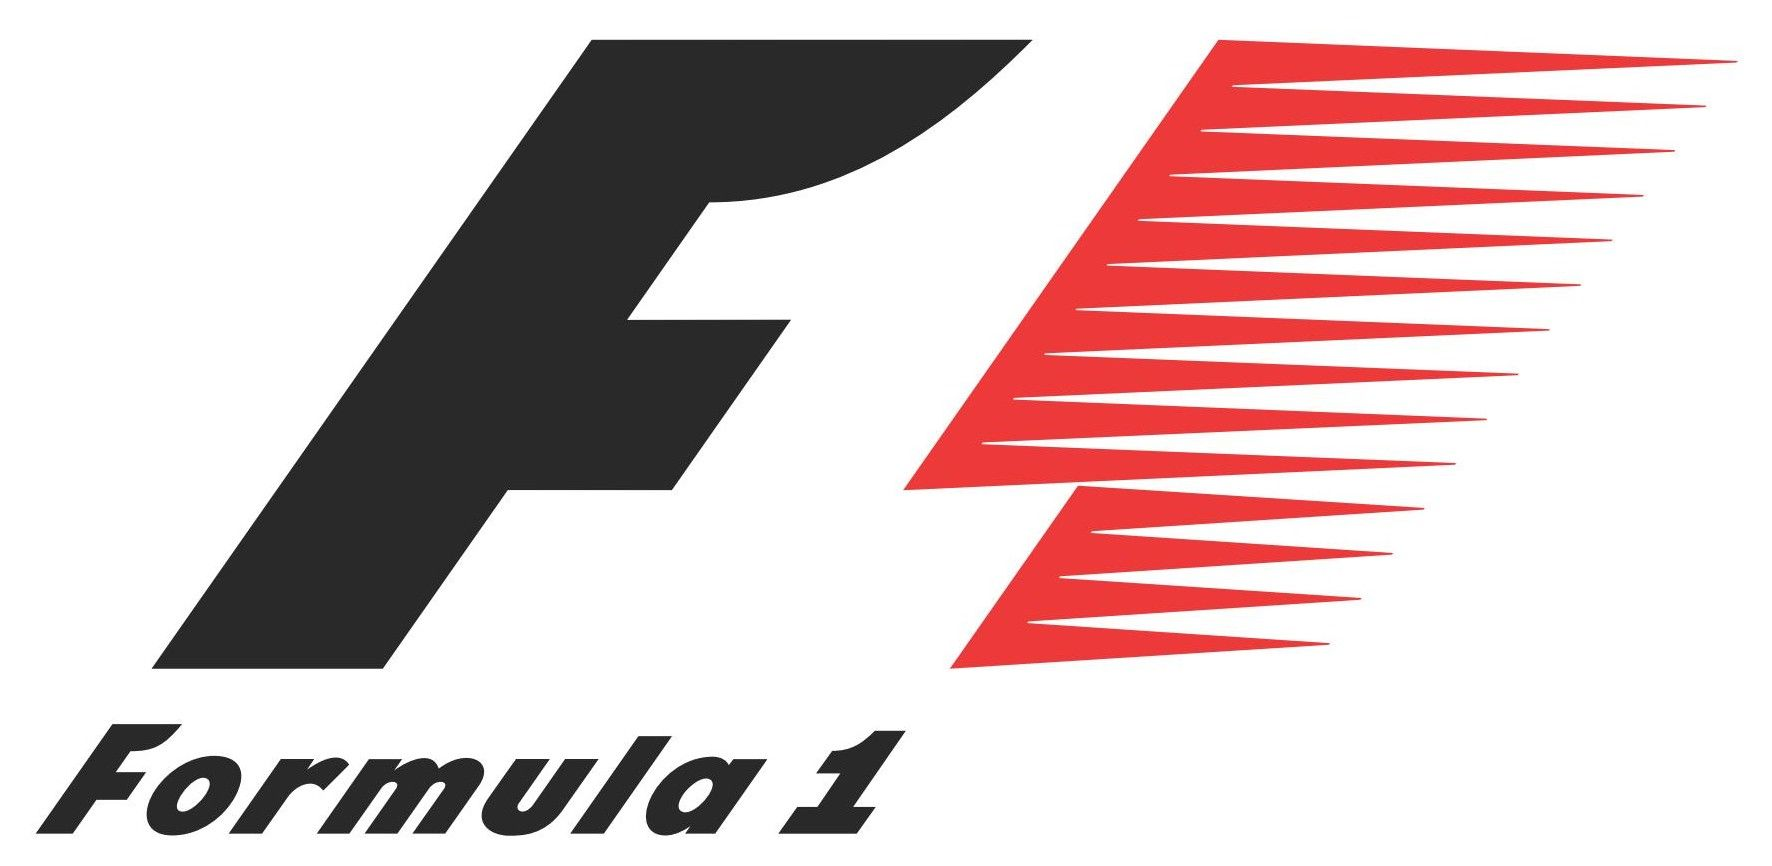 Formula 1 Logo [EPS File] -  auto racing, auto sport motor, car, Car Championship, car racing, Championship, eps, eps file, eps format, eps logo, f, f1, Fédération Internationale de l'Automobile, FIA, FIA Formula One World Championship, formel 1, formula, Formula 1, fórmula f1, formula one, Formula One World Championship, formule un, motor racing cars, motor show, touring, touring car, touring car championship, touring car championships, touring car racing series